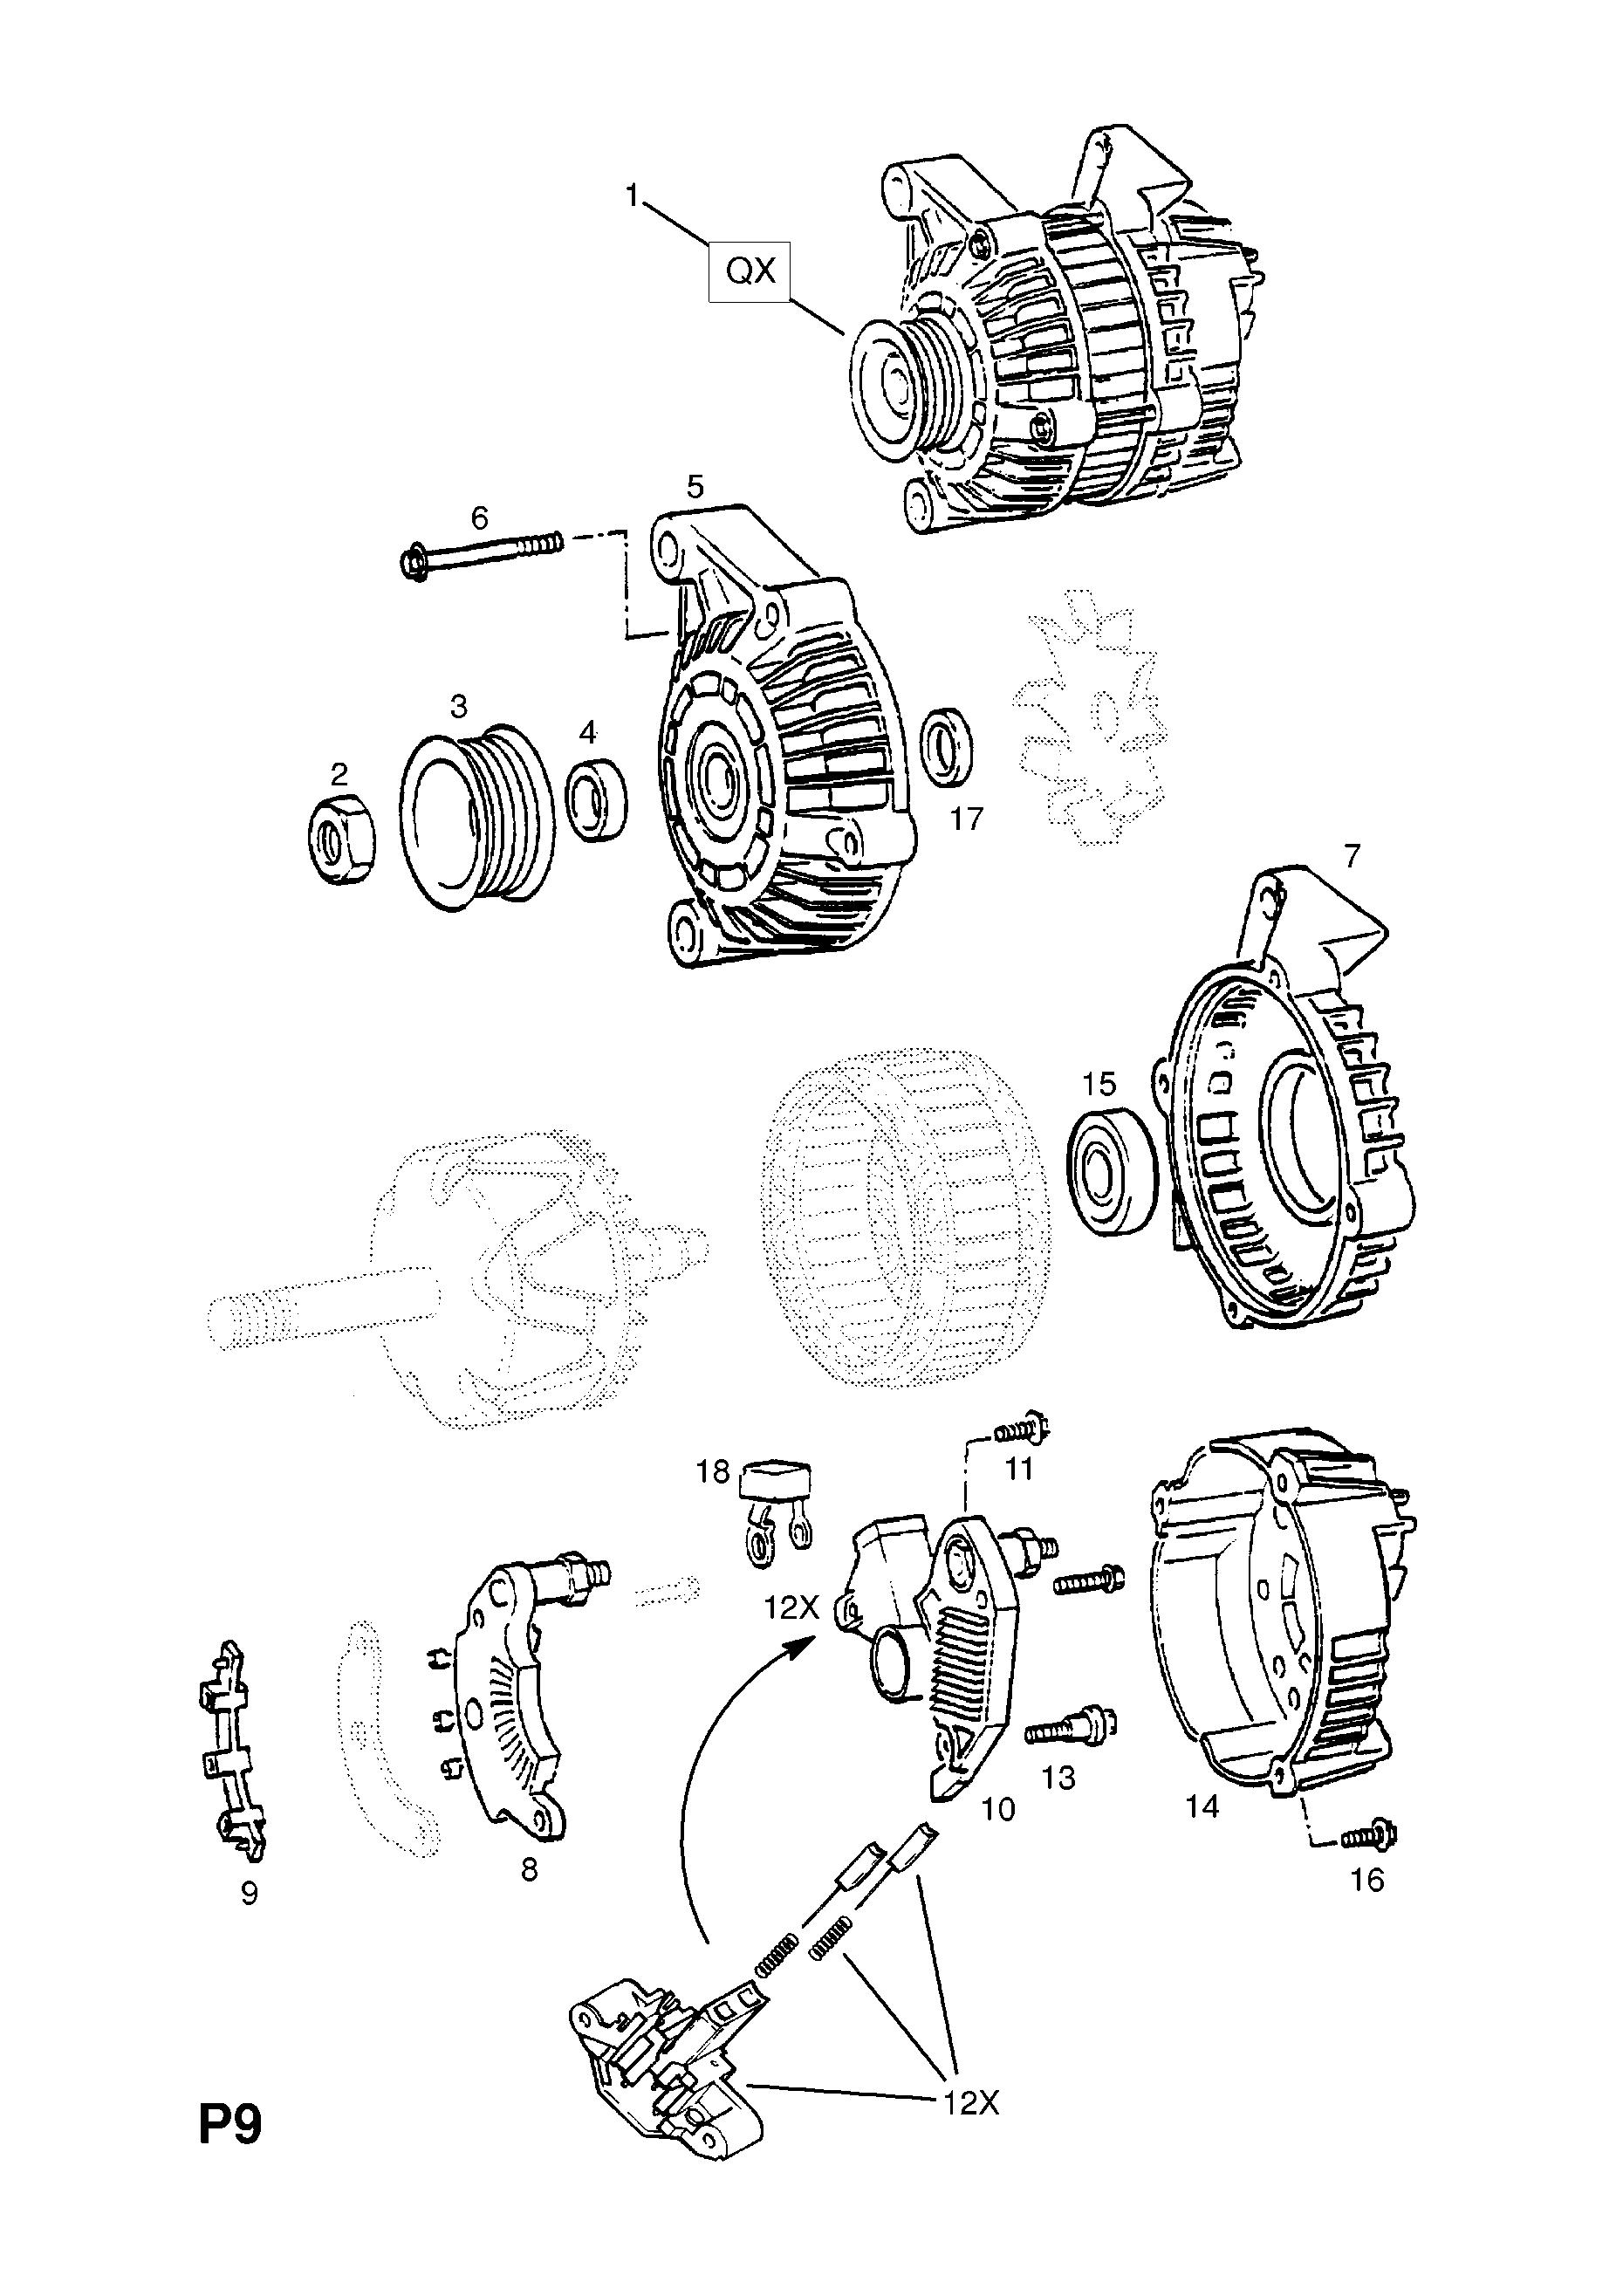 opel vectra b 1996 2002 p electrical 1 engine and cooling 9 1996 Chrysler Alternator Wiring Diagram gm part number genuine part number description range